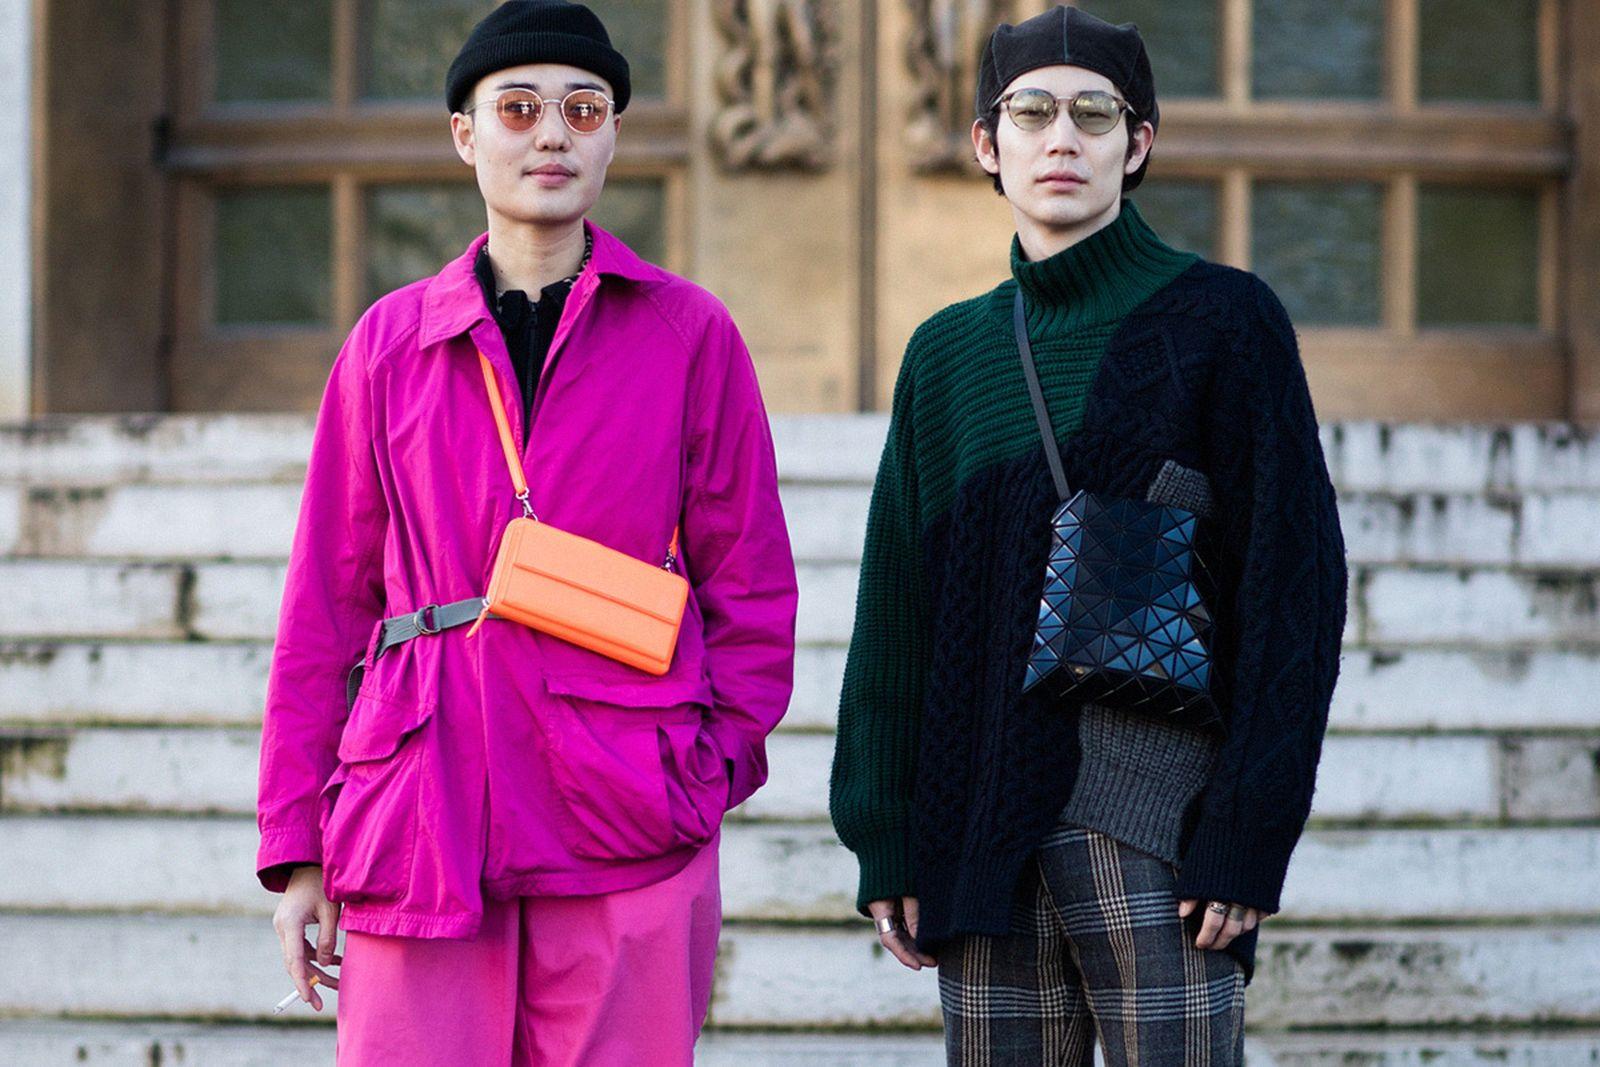 mens purses are coming main Acne Studios Fendi Louis Vuitton